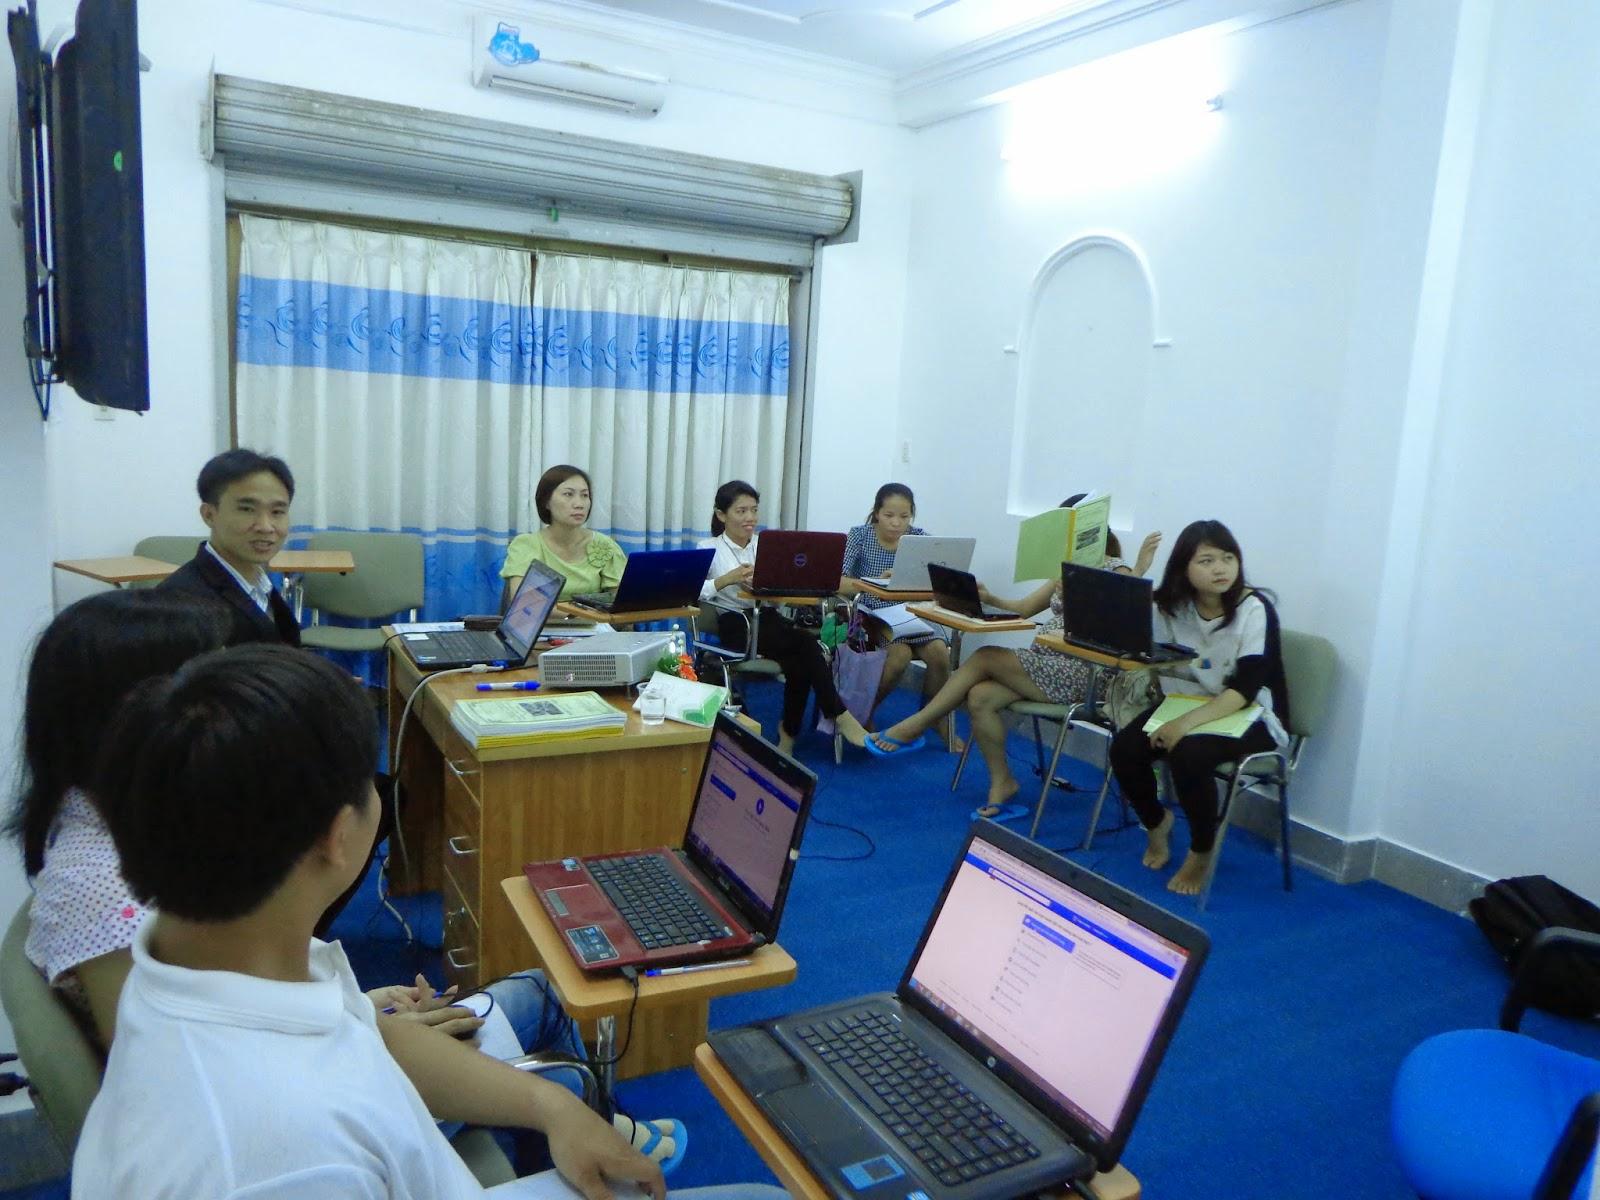 khoa-hoc-facebook-ads-va-google-adwords-tai-hcm (2)